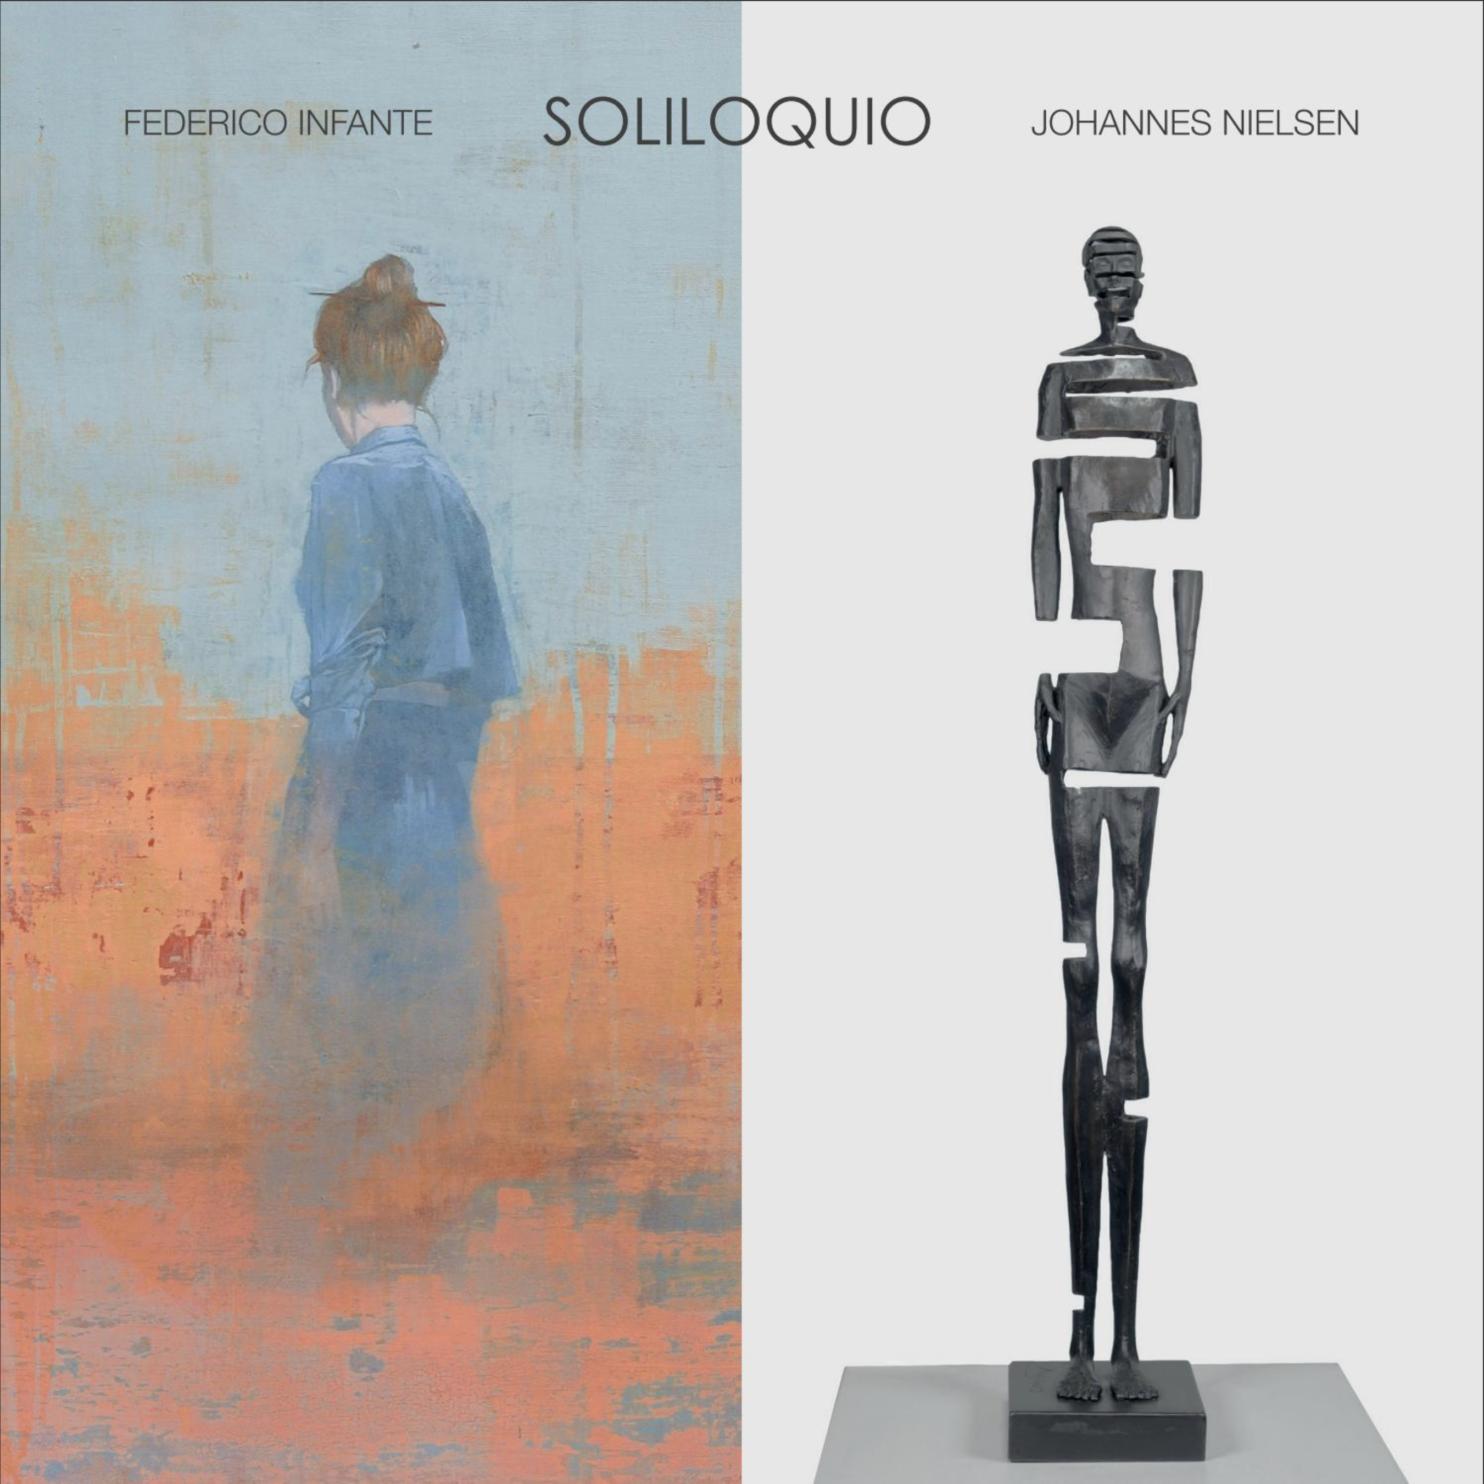 SOLILOQUIO | FEDERICO INFANTE | JOHANNES NIELSEN